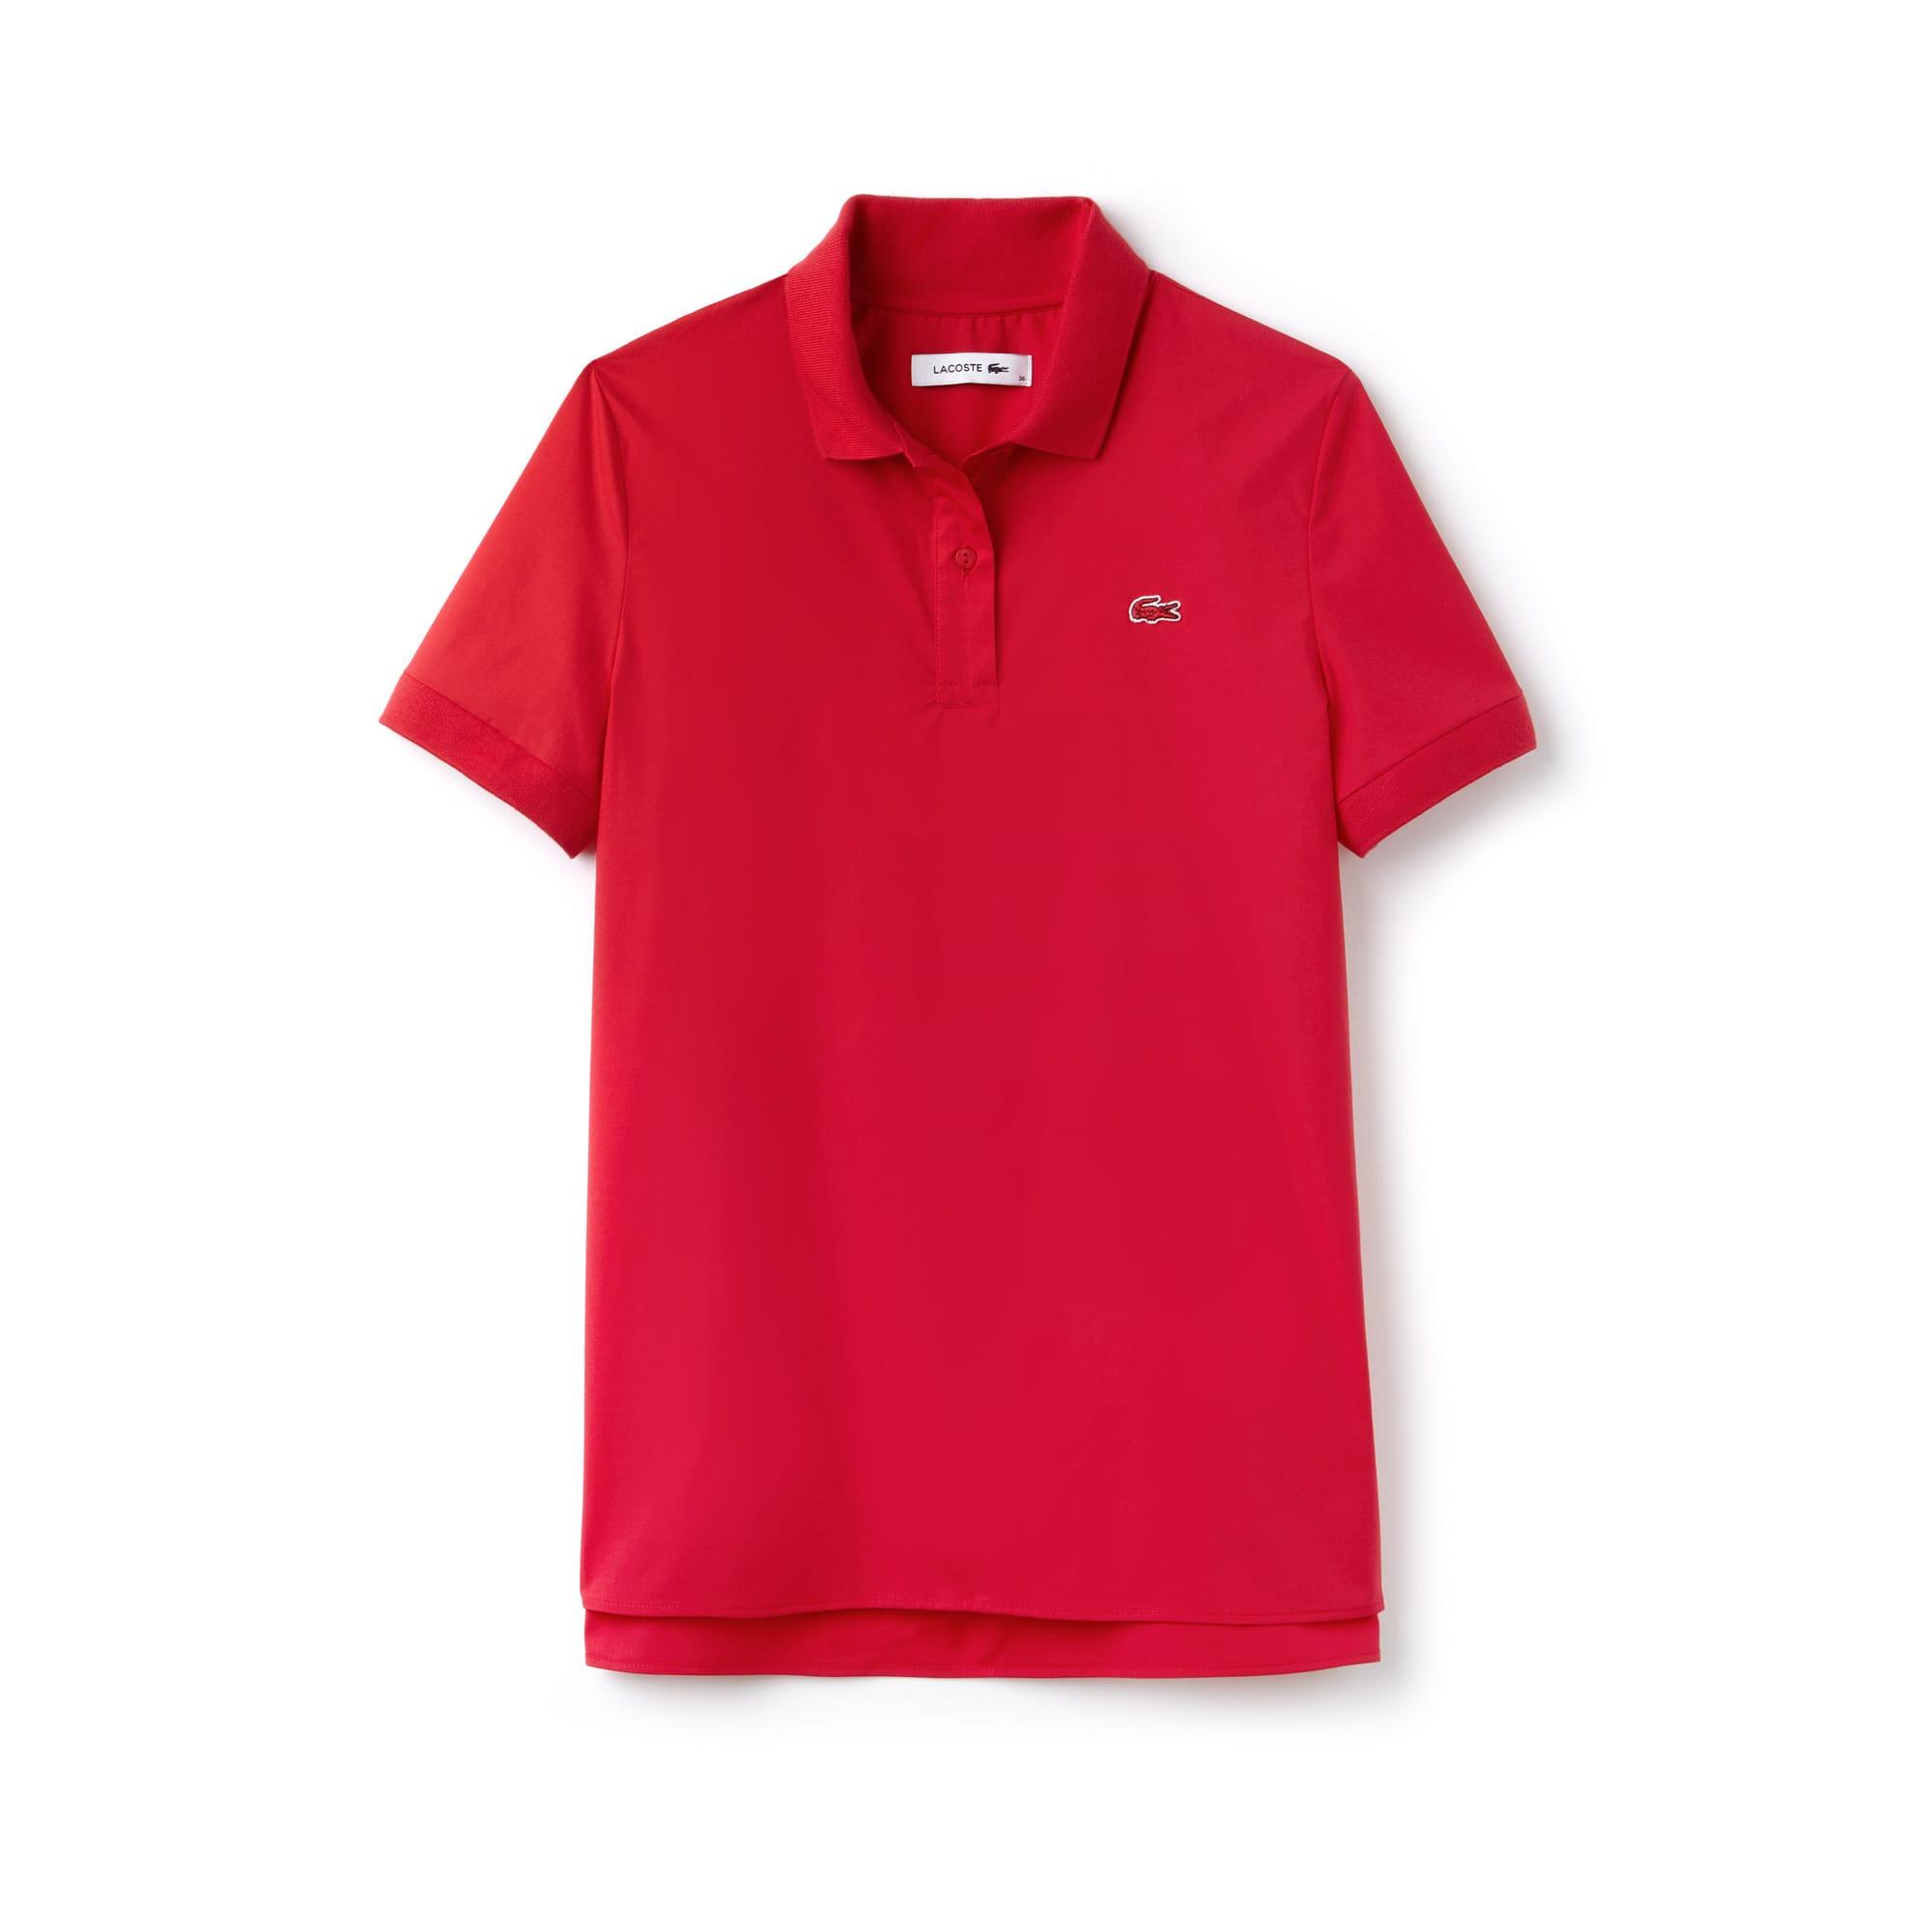 Regular Fit Damen-Poloshirt aus Stretch-Popeline PARIS Kollektion